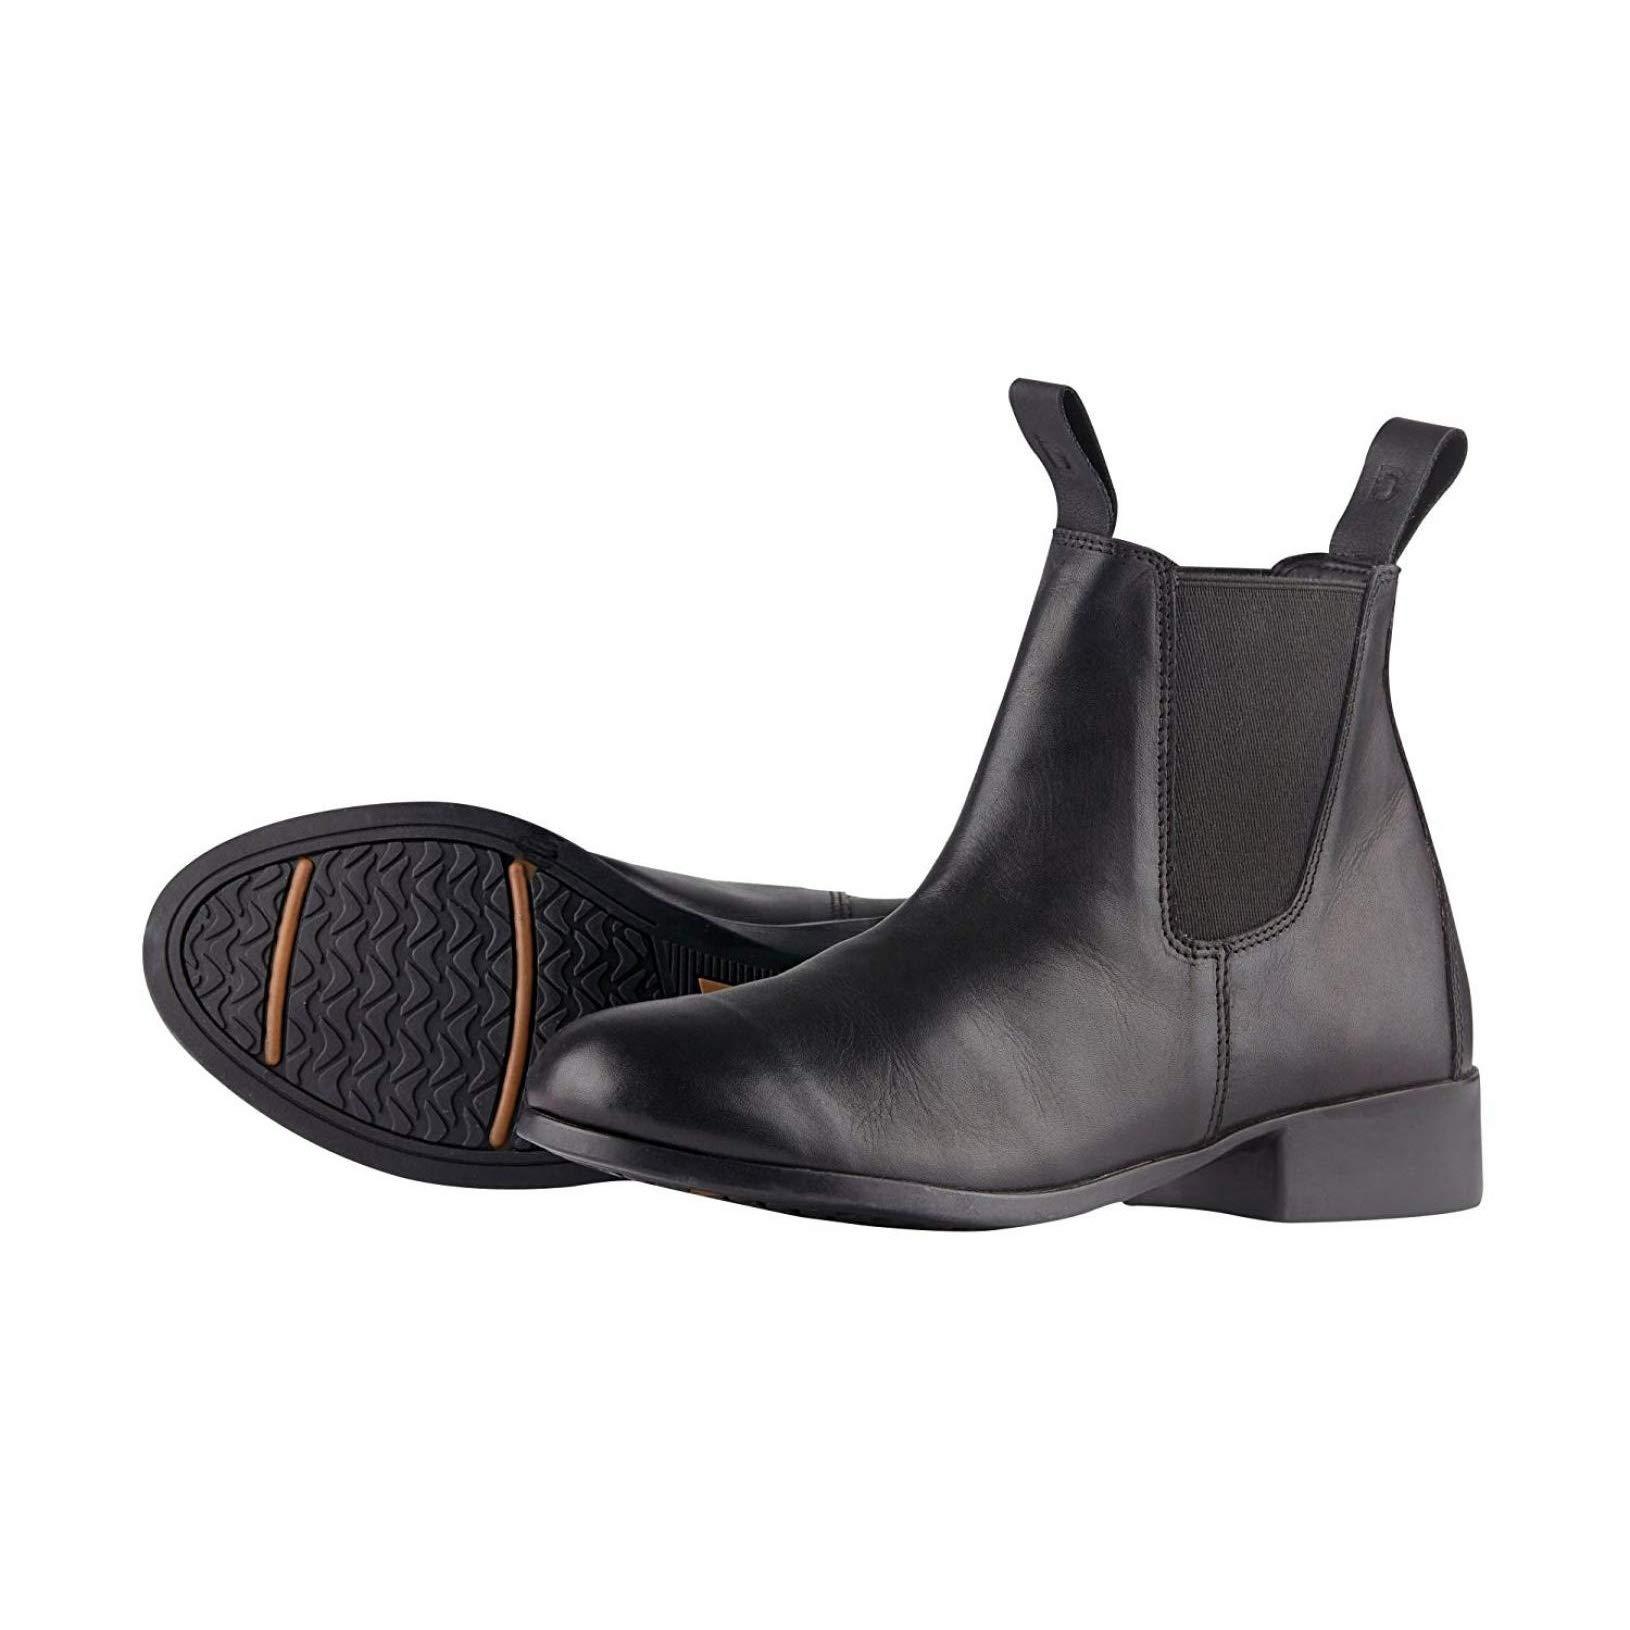 Dublin Childrens/Kids Elevation Jodhpur Boots II (12 M US Little Kid) (Black)